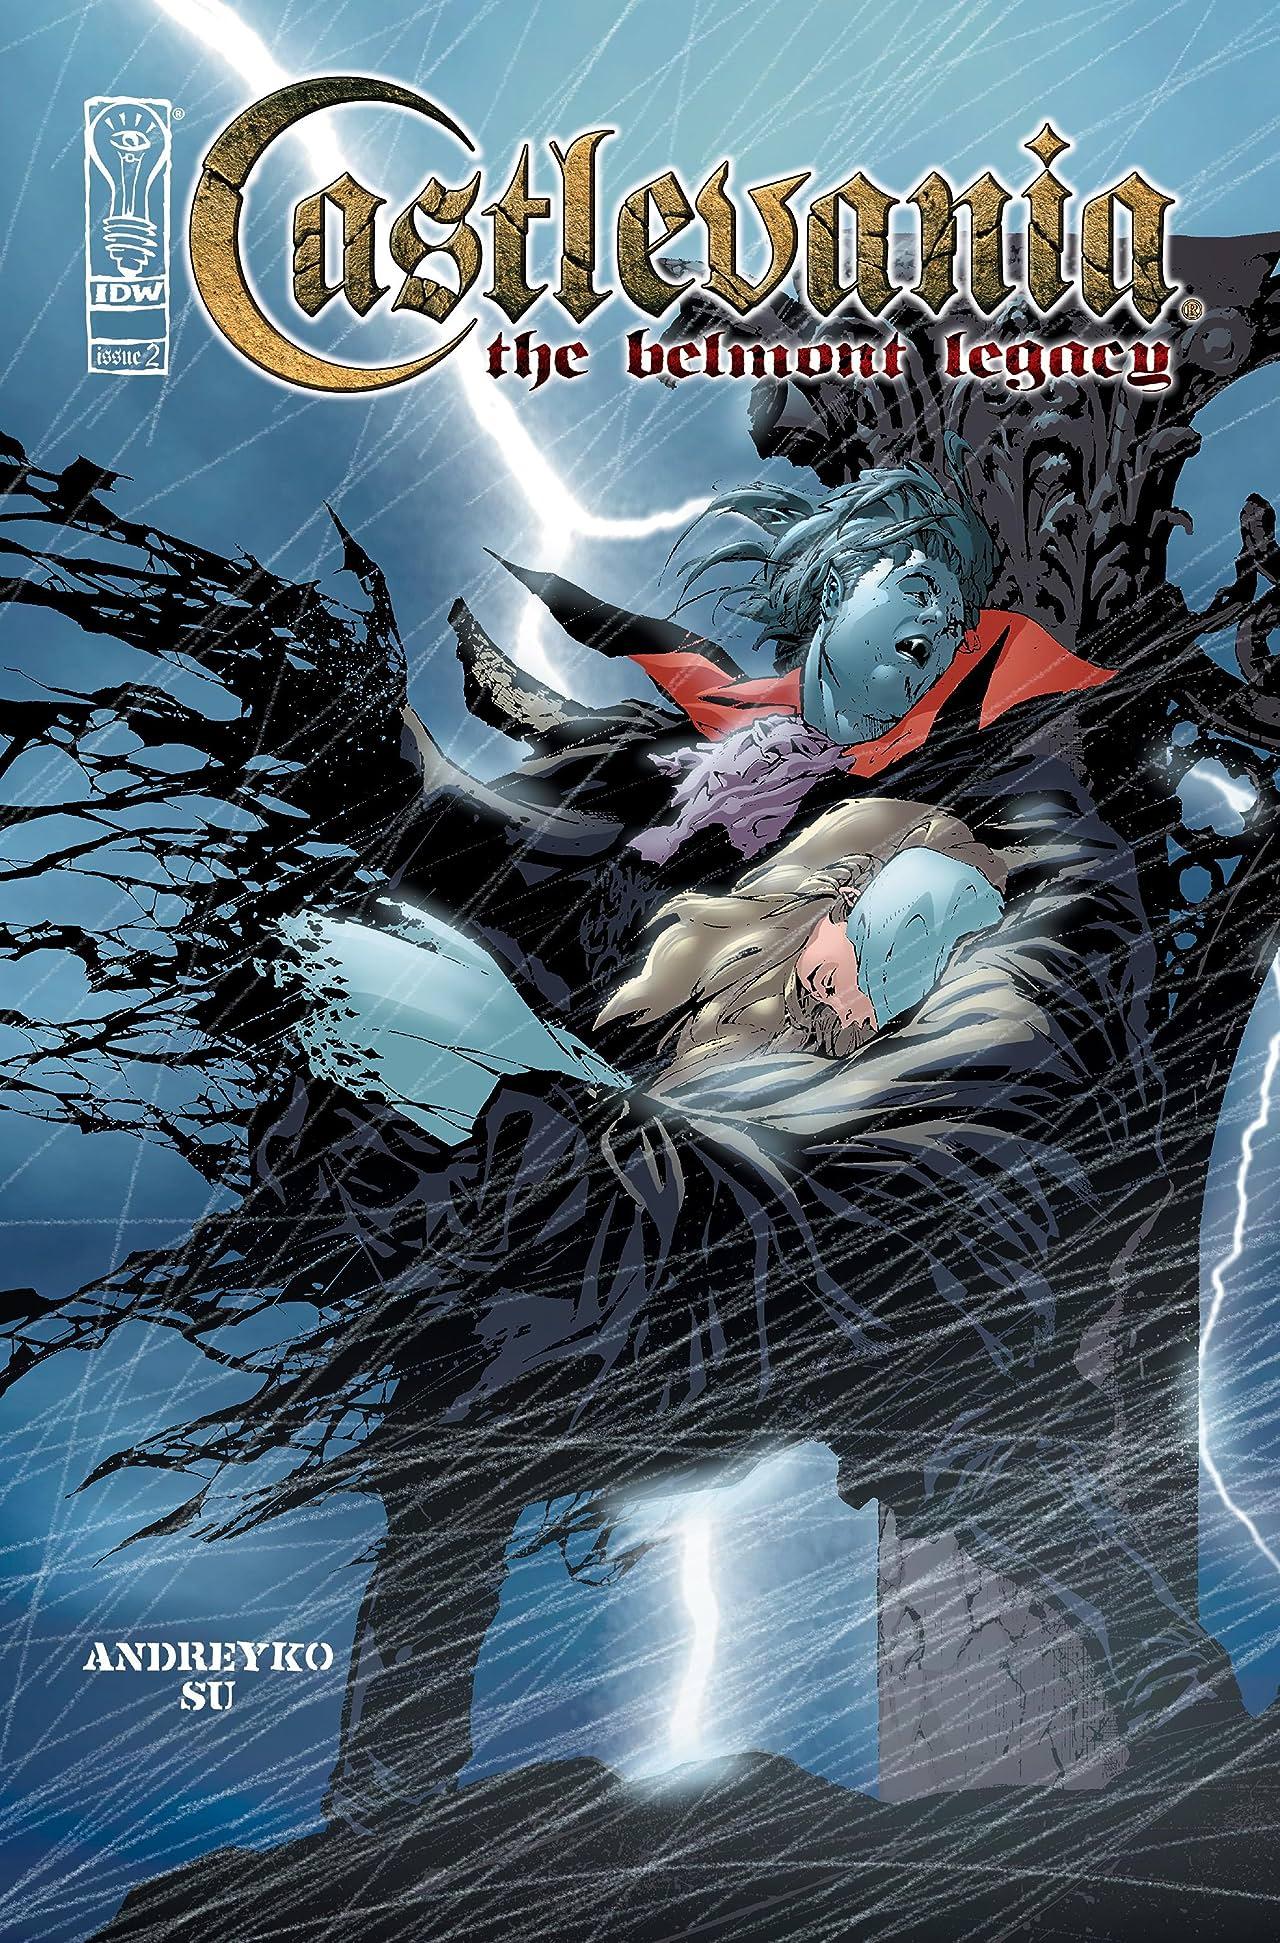 Castlevania #2: The Belmont Legacy